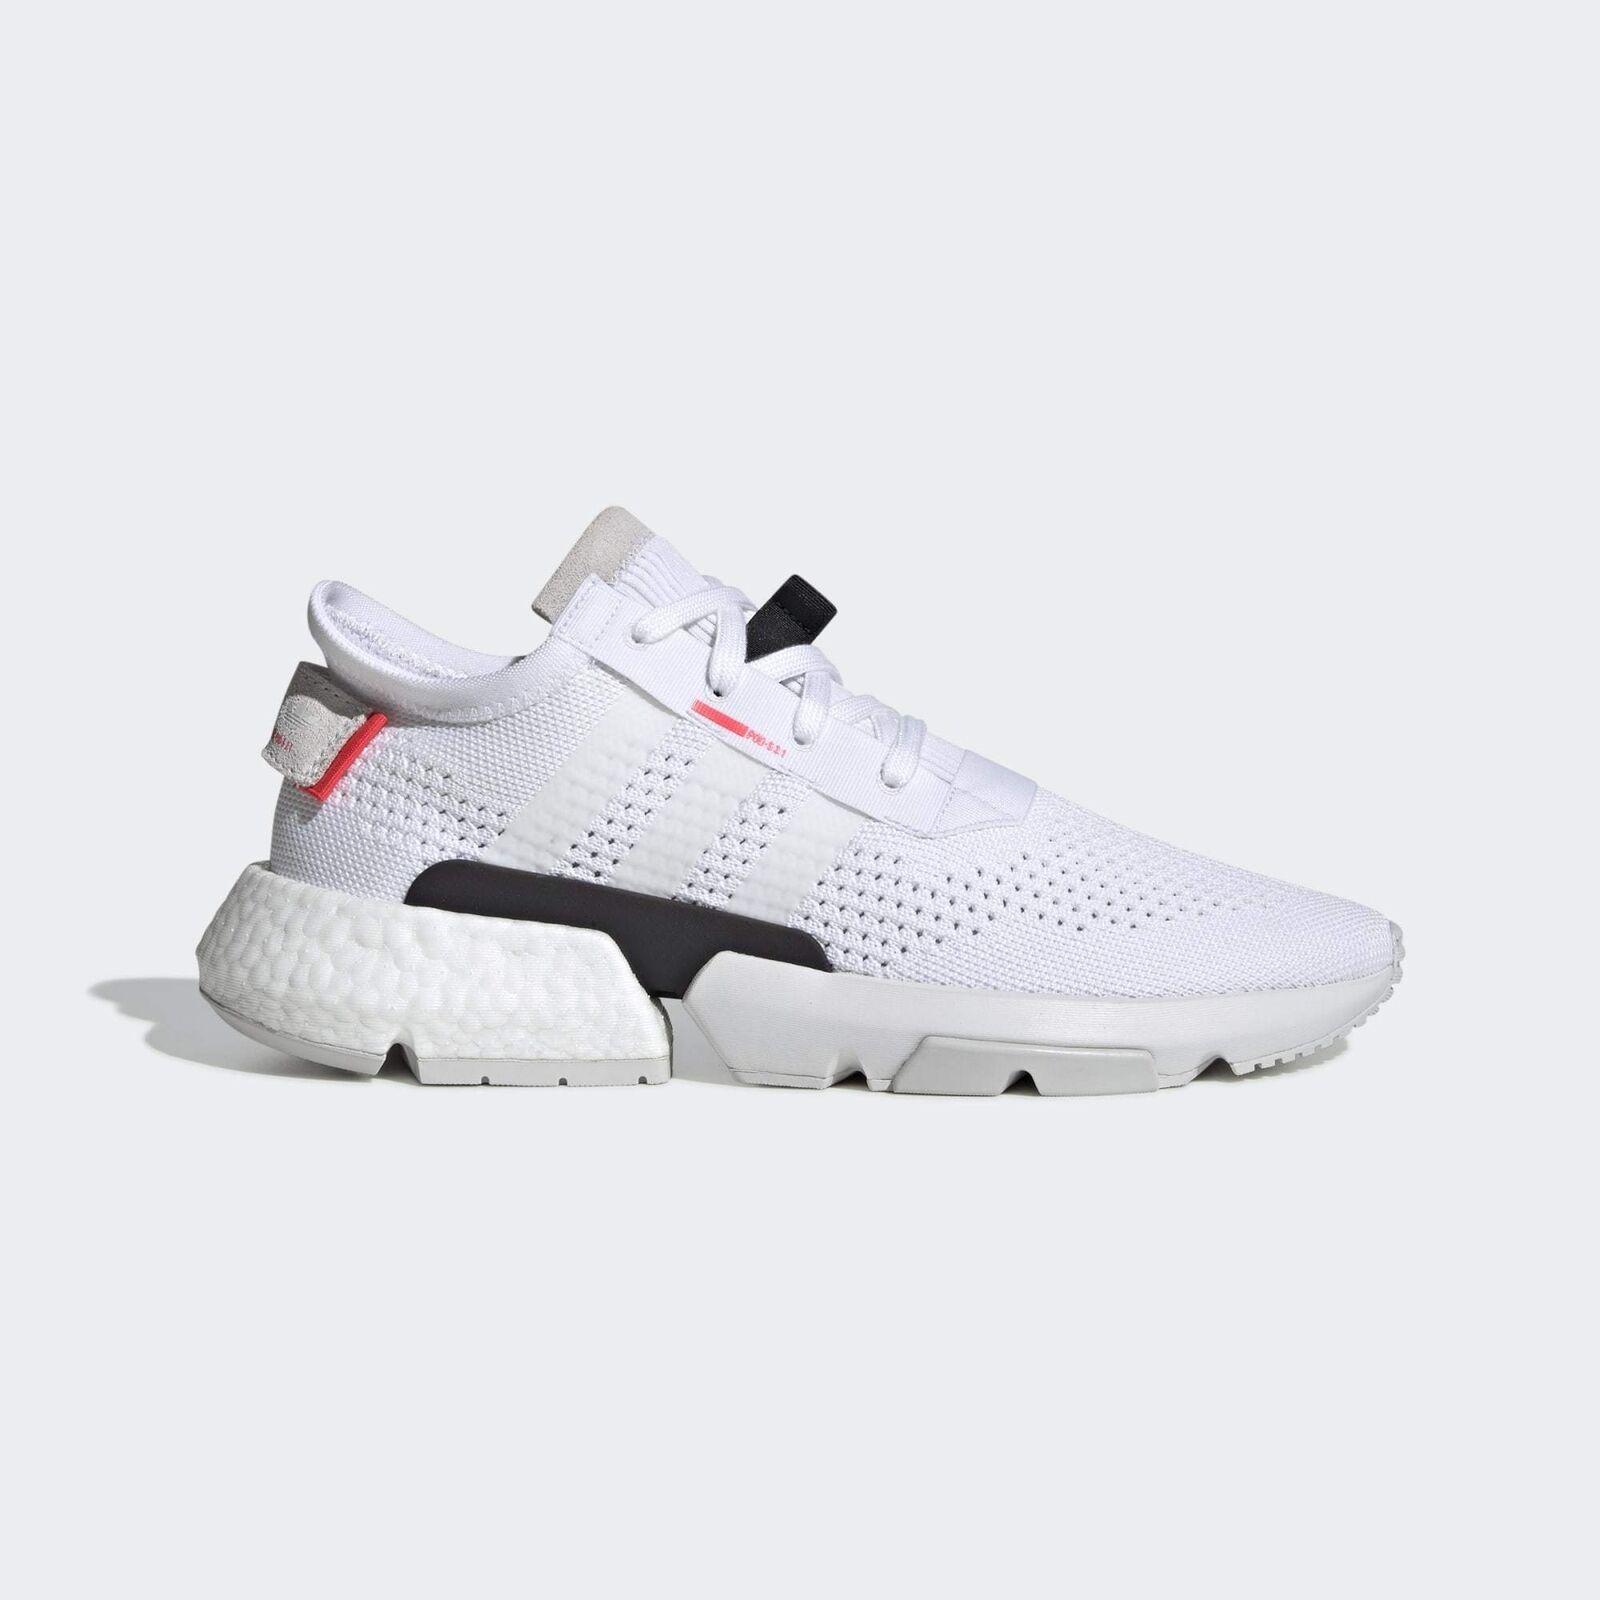 Adidas SHOES POD-S3.1 men sneakers white